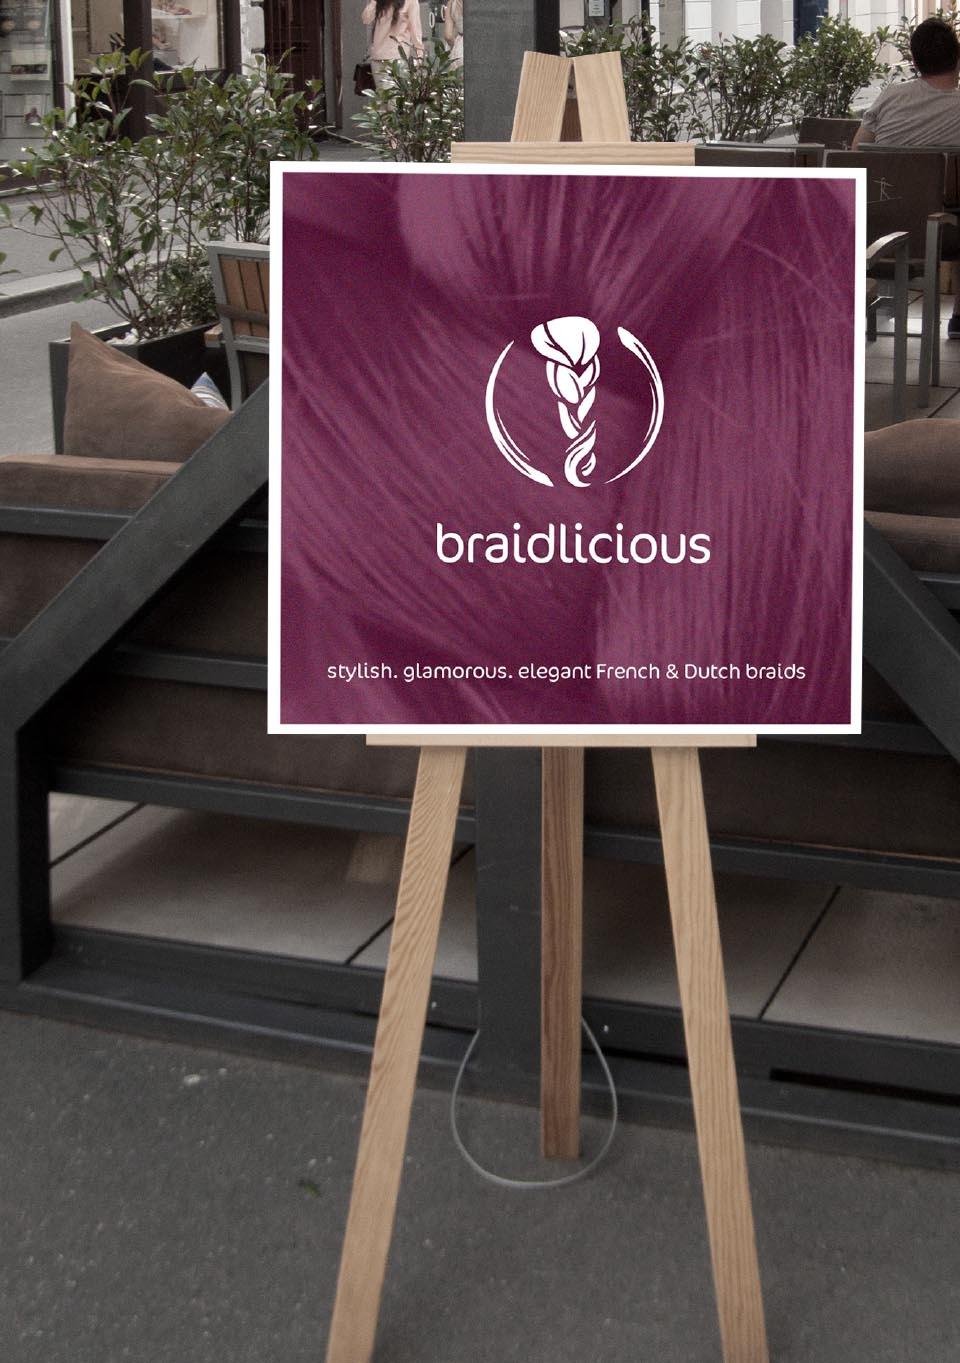 Braiding-Bar-Berkshire-Branding-Signage